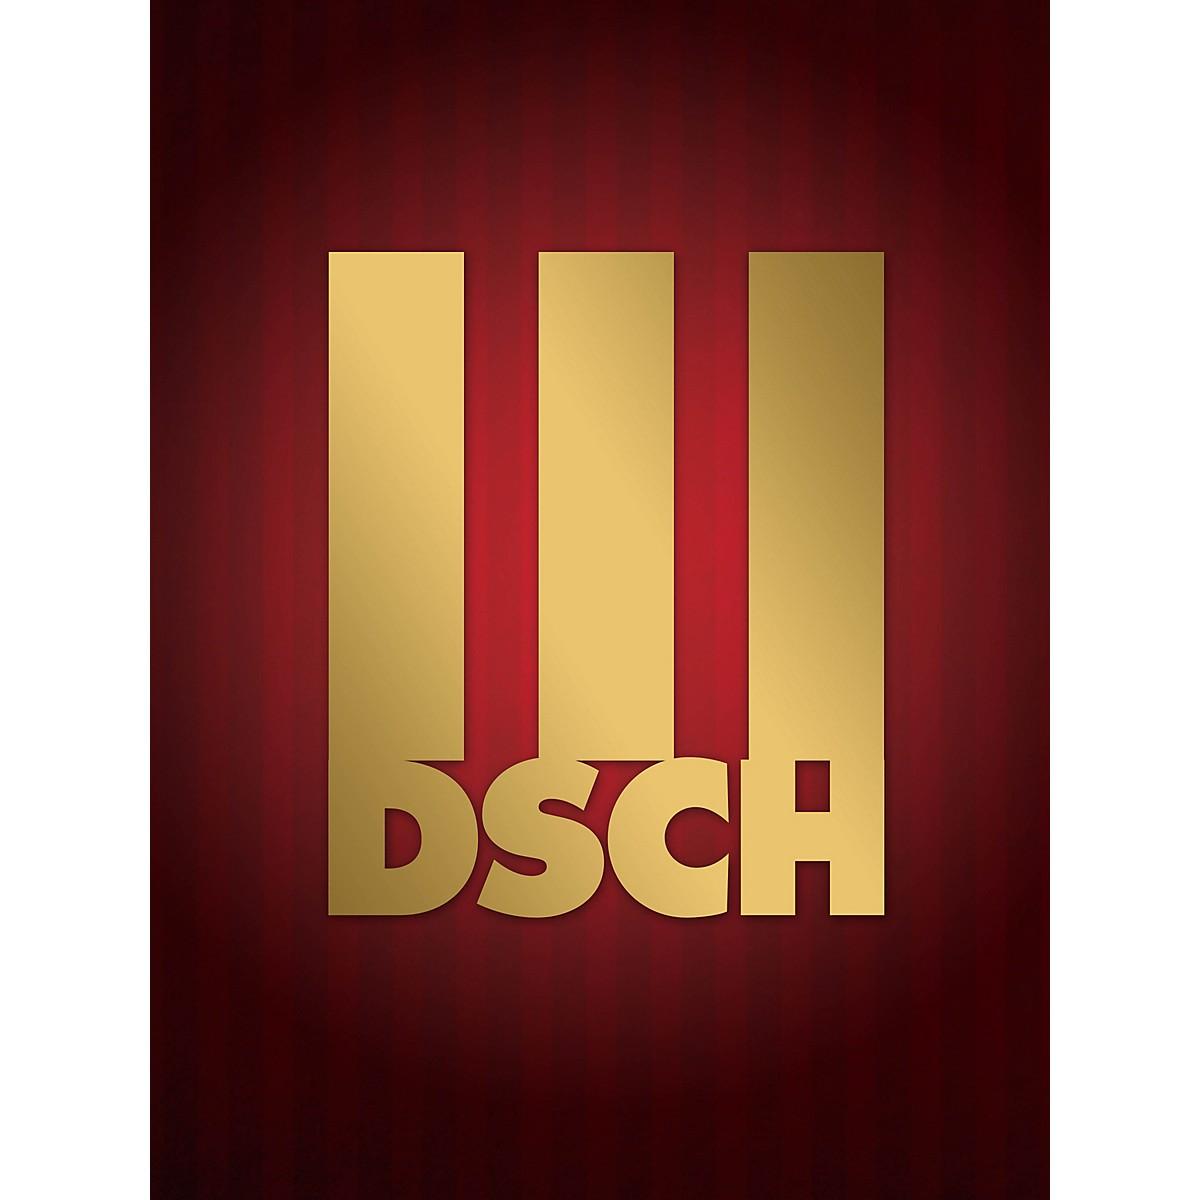 DSCH Anti-Formalist Rayok Sans Op. DSCH Series Hardcover